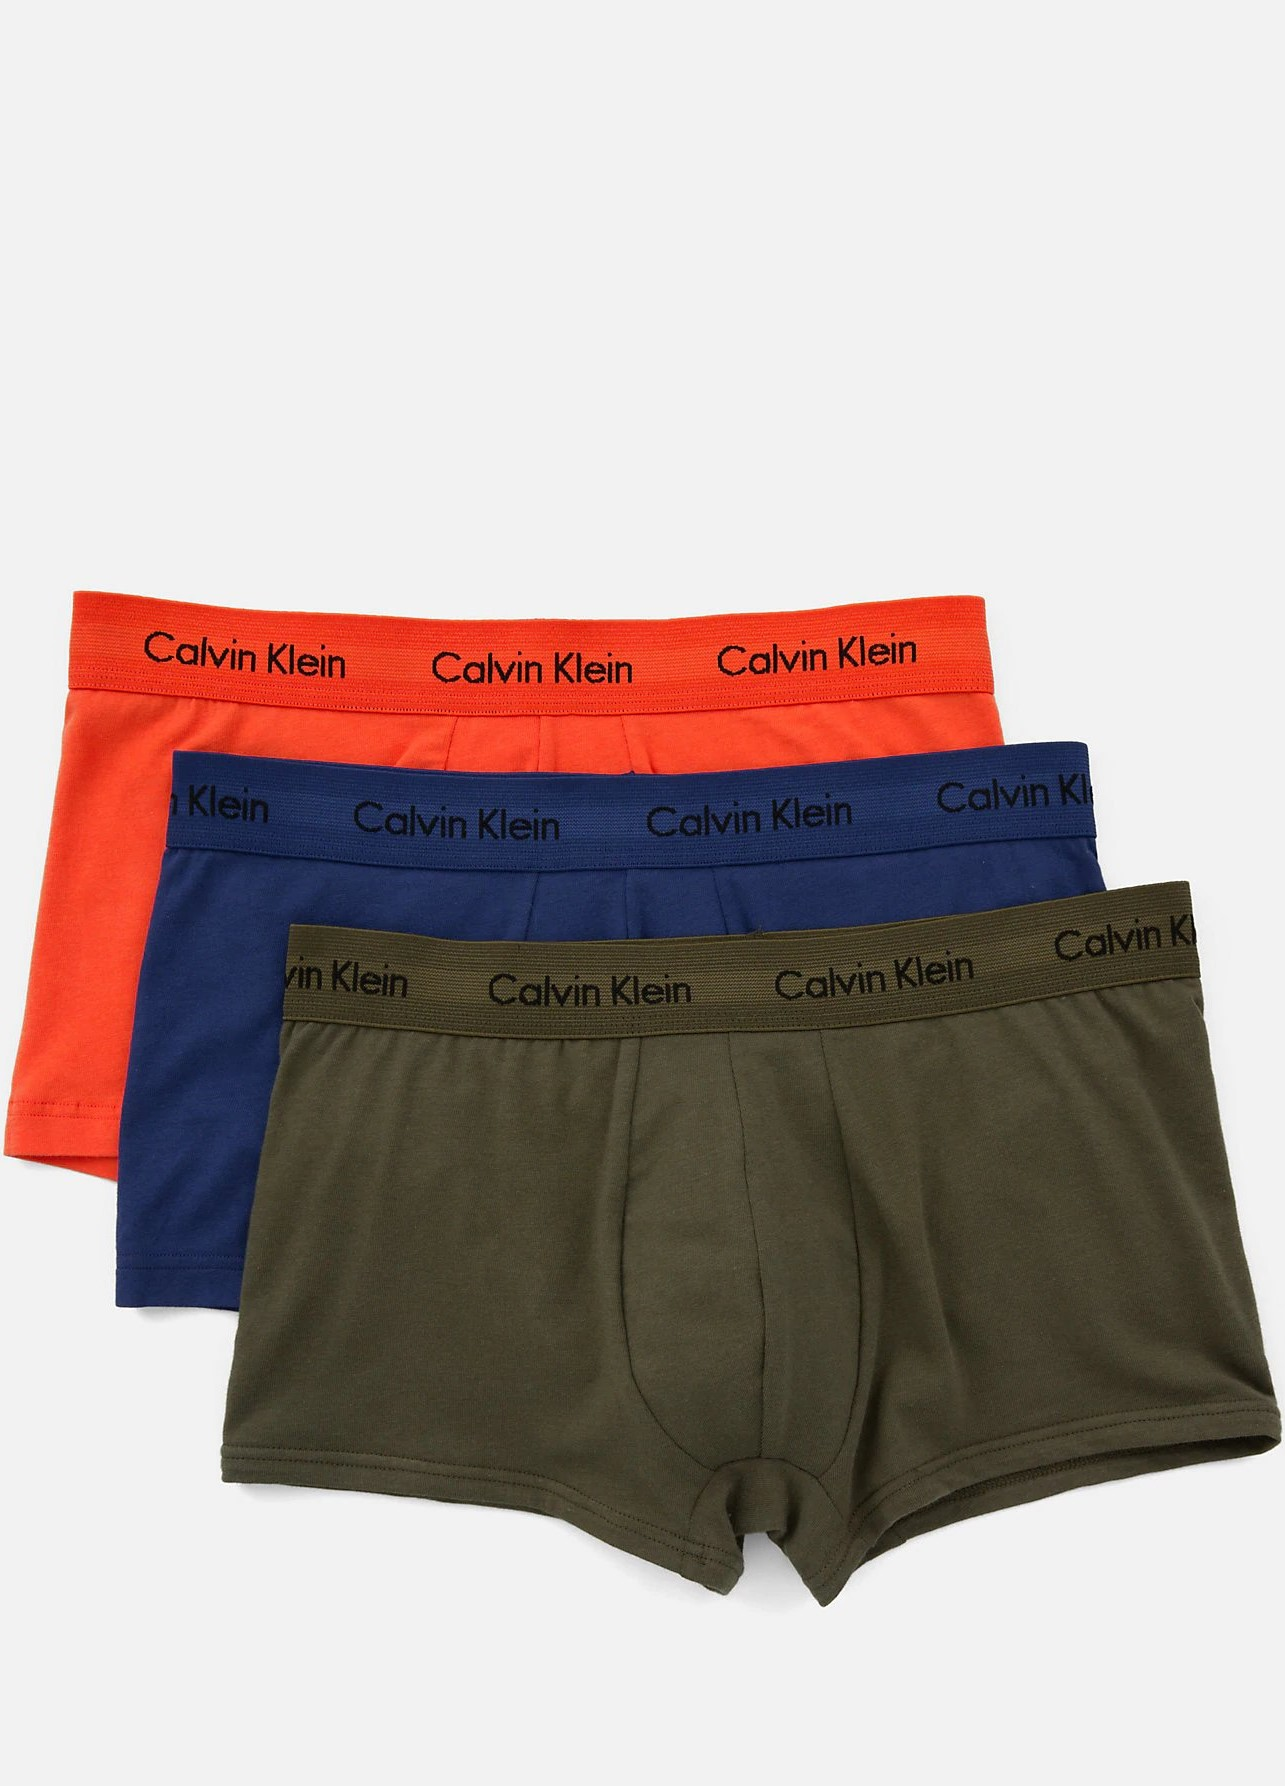 d3c2e2059 Calvin Klein 3 pack barevných pánských boxerek Cotton Stretch - XL ...